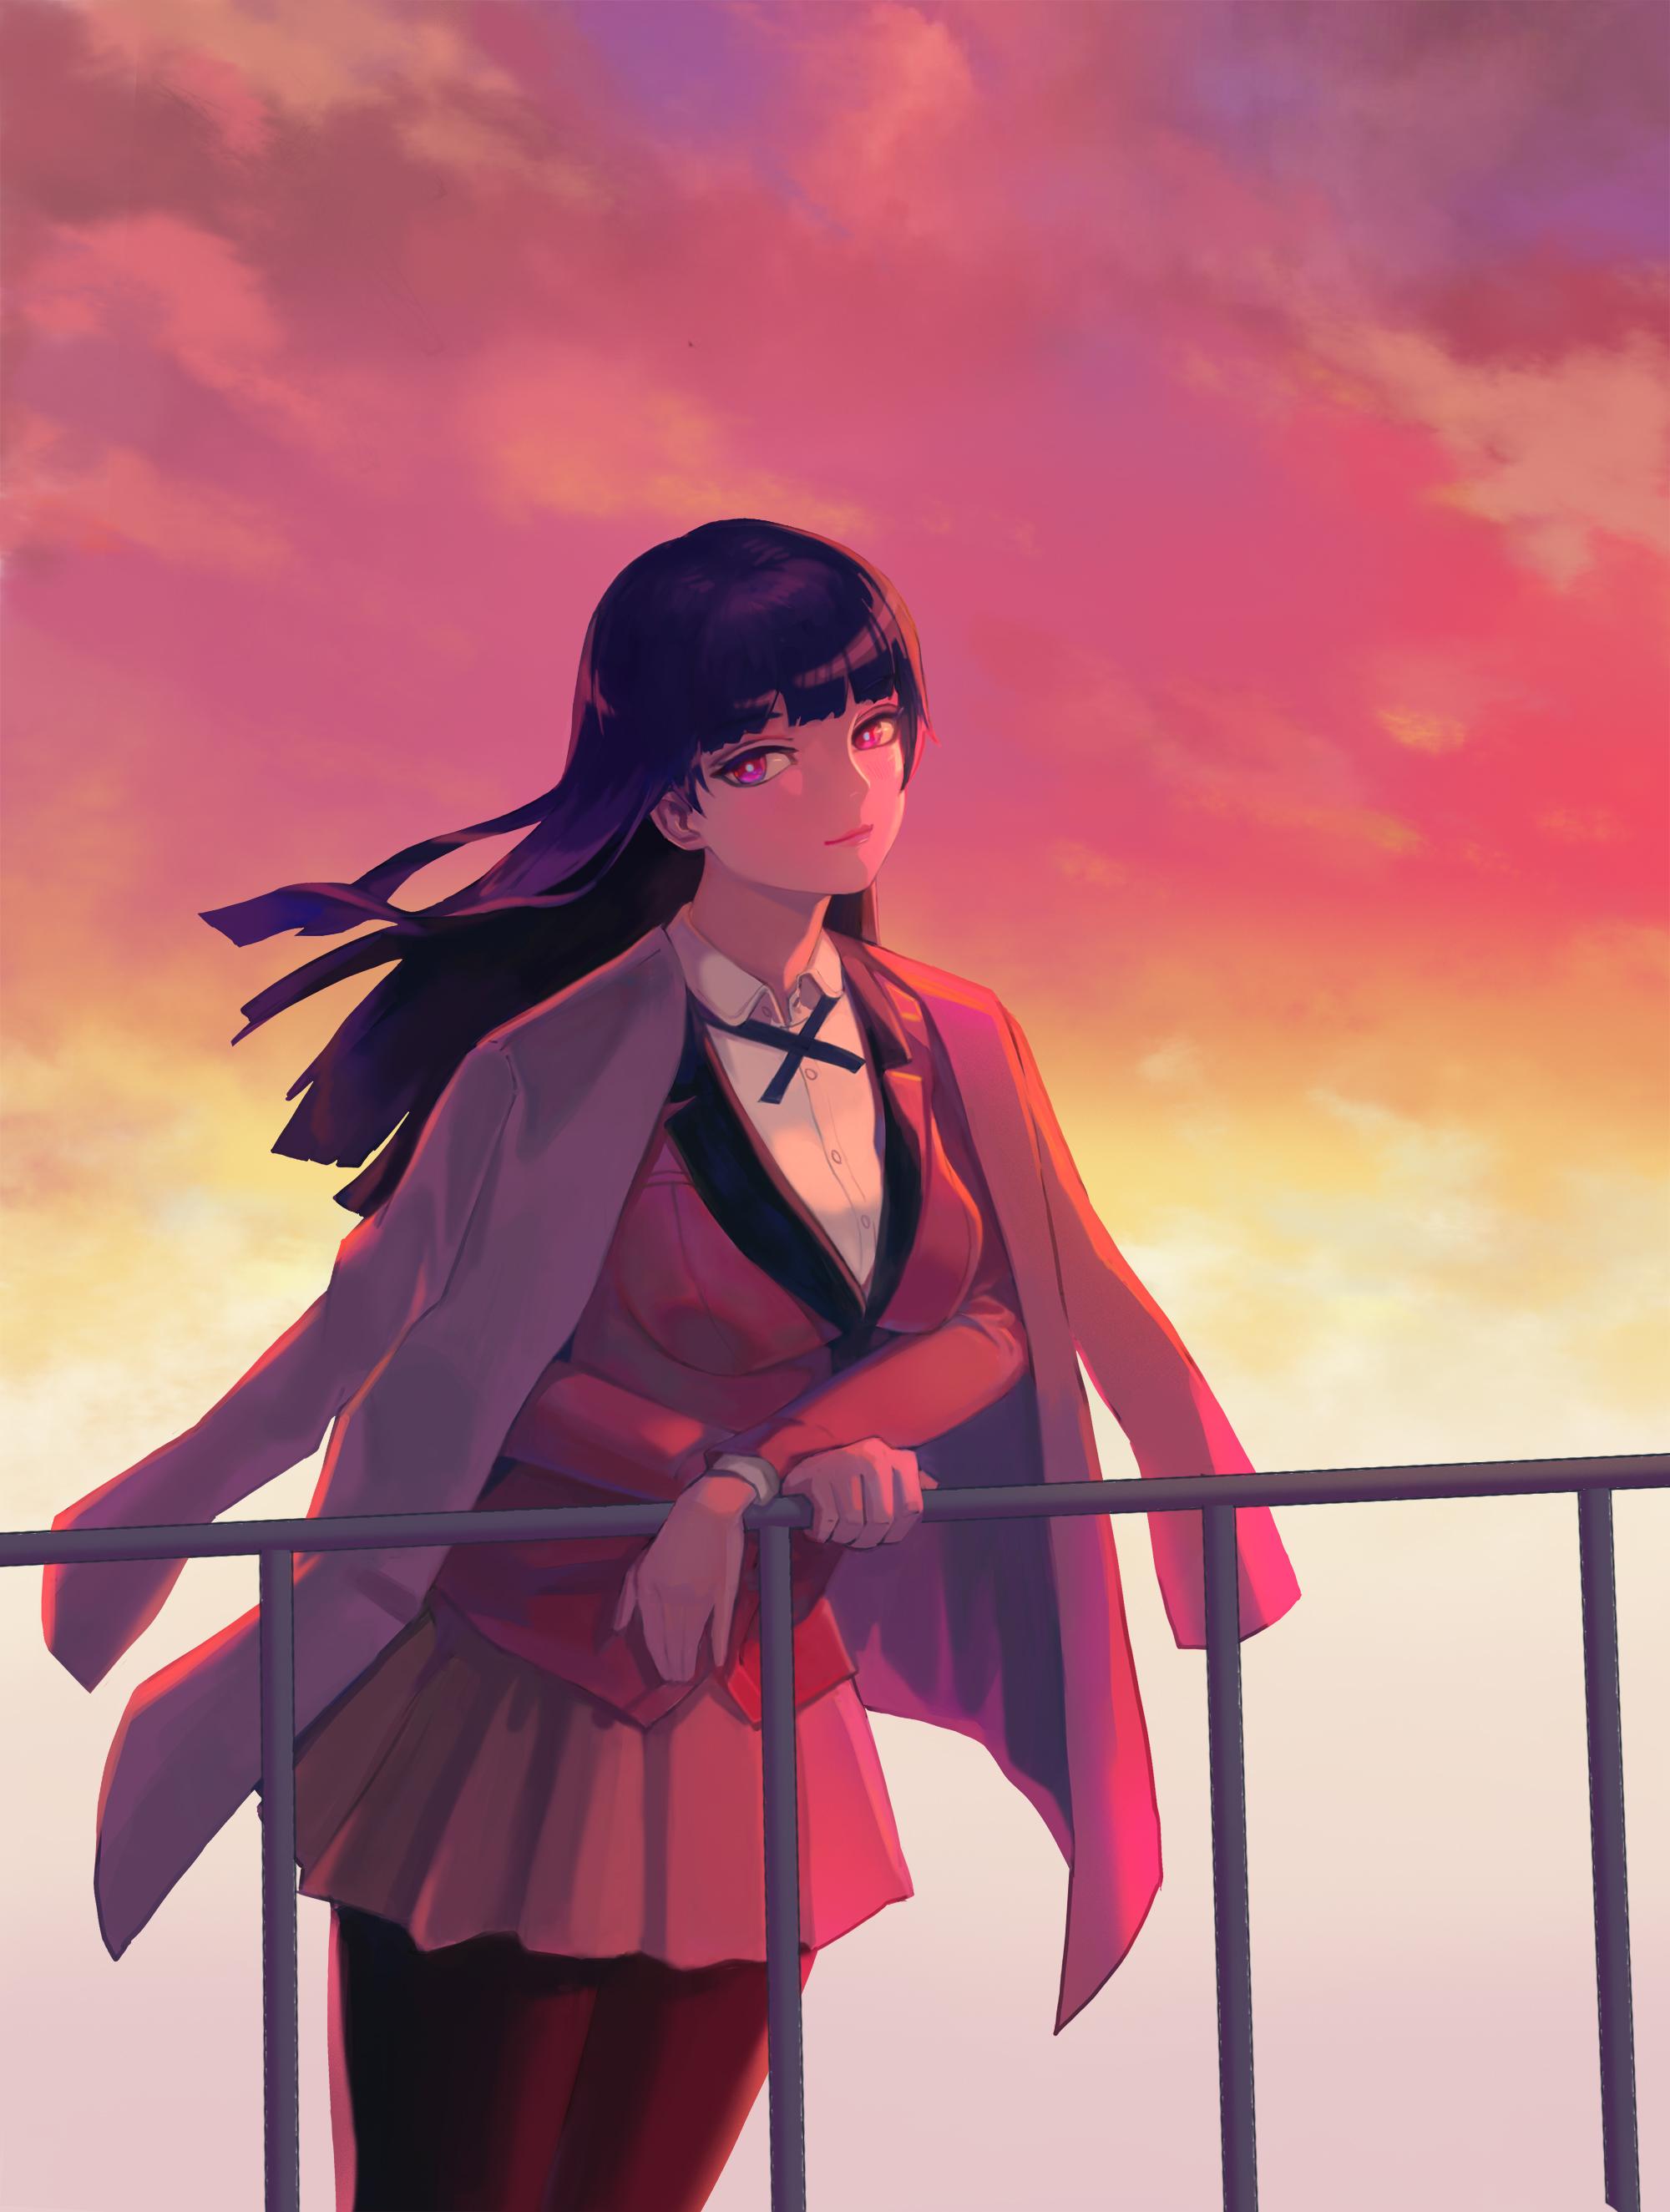 Kakegurui wallpapers high quality download free - Fanart anime wallpaper ...